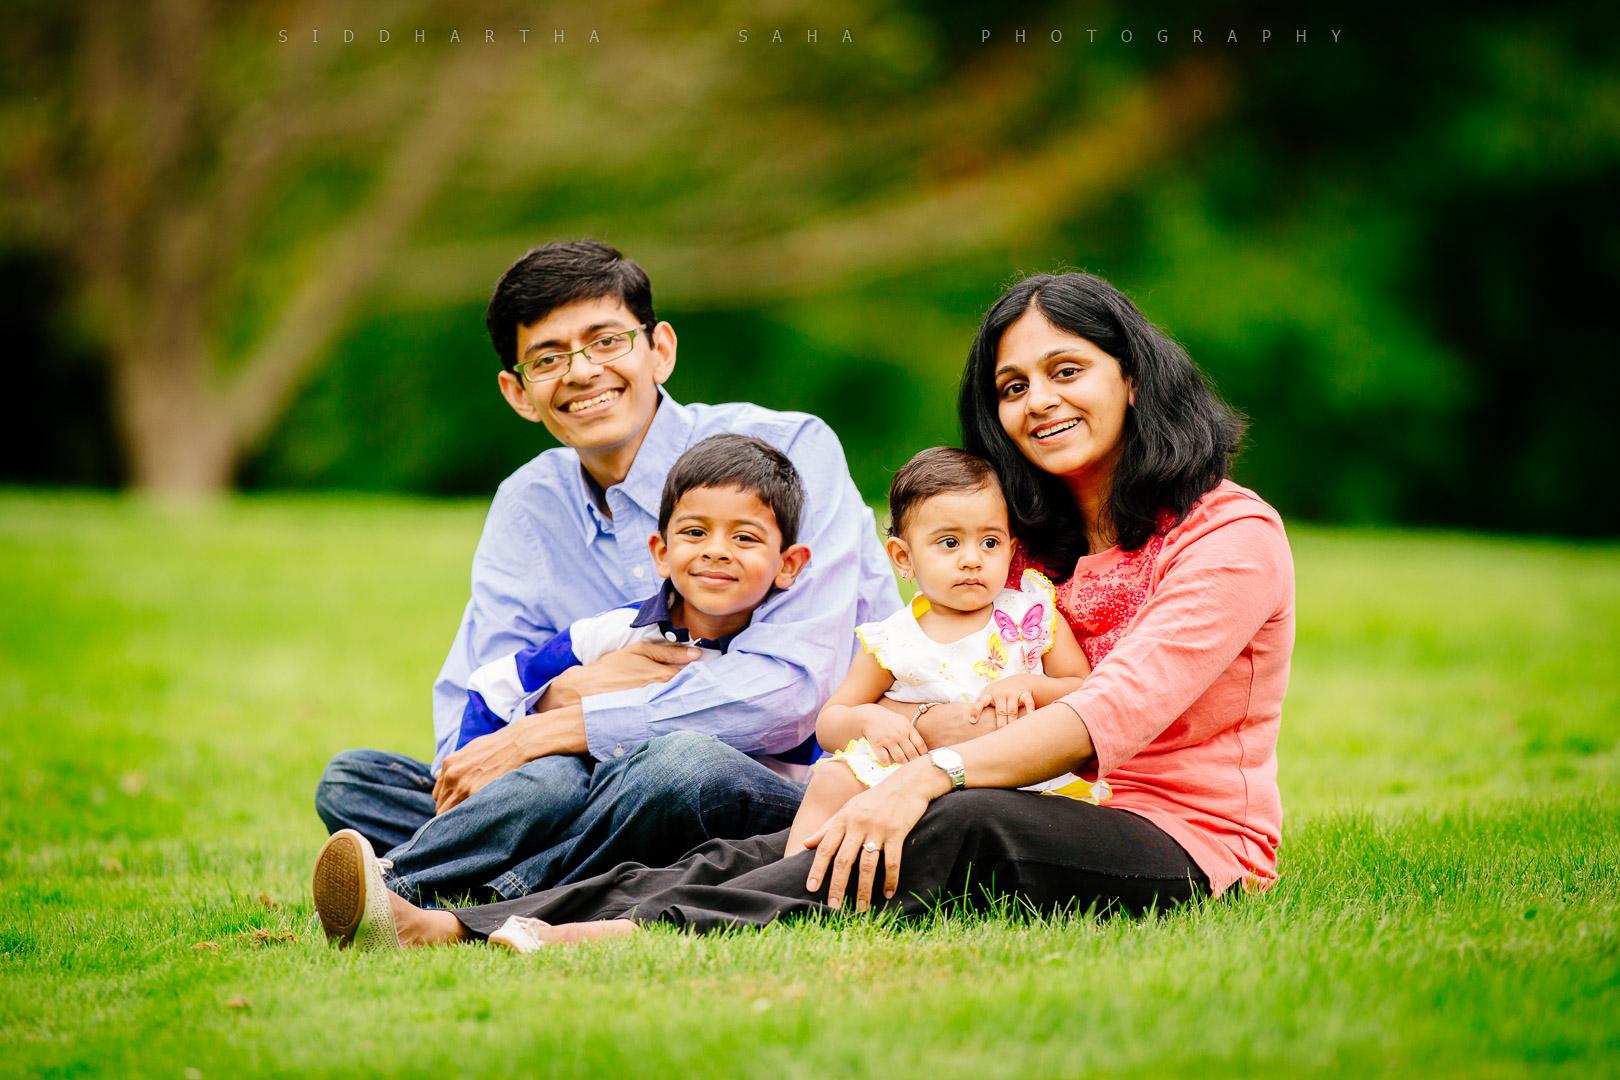 2015-08-08 - Padmaja Ketan Family Photoshoot - _05Y8503